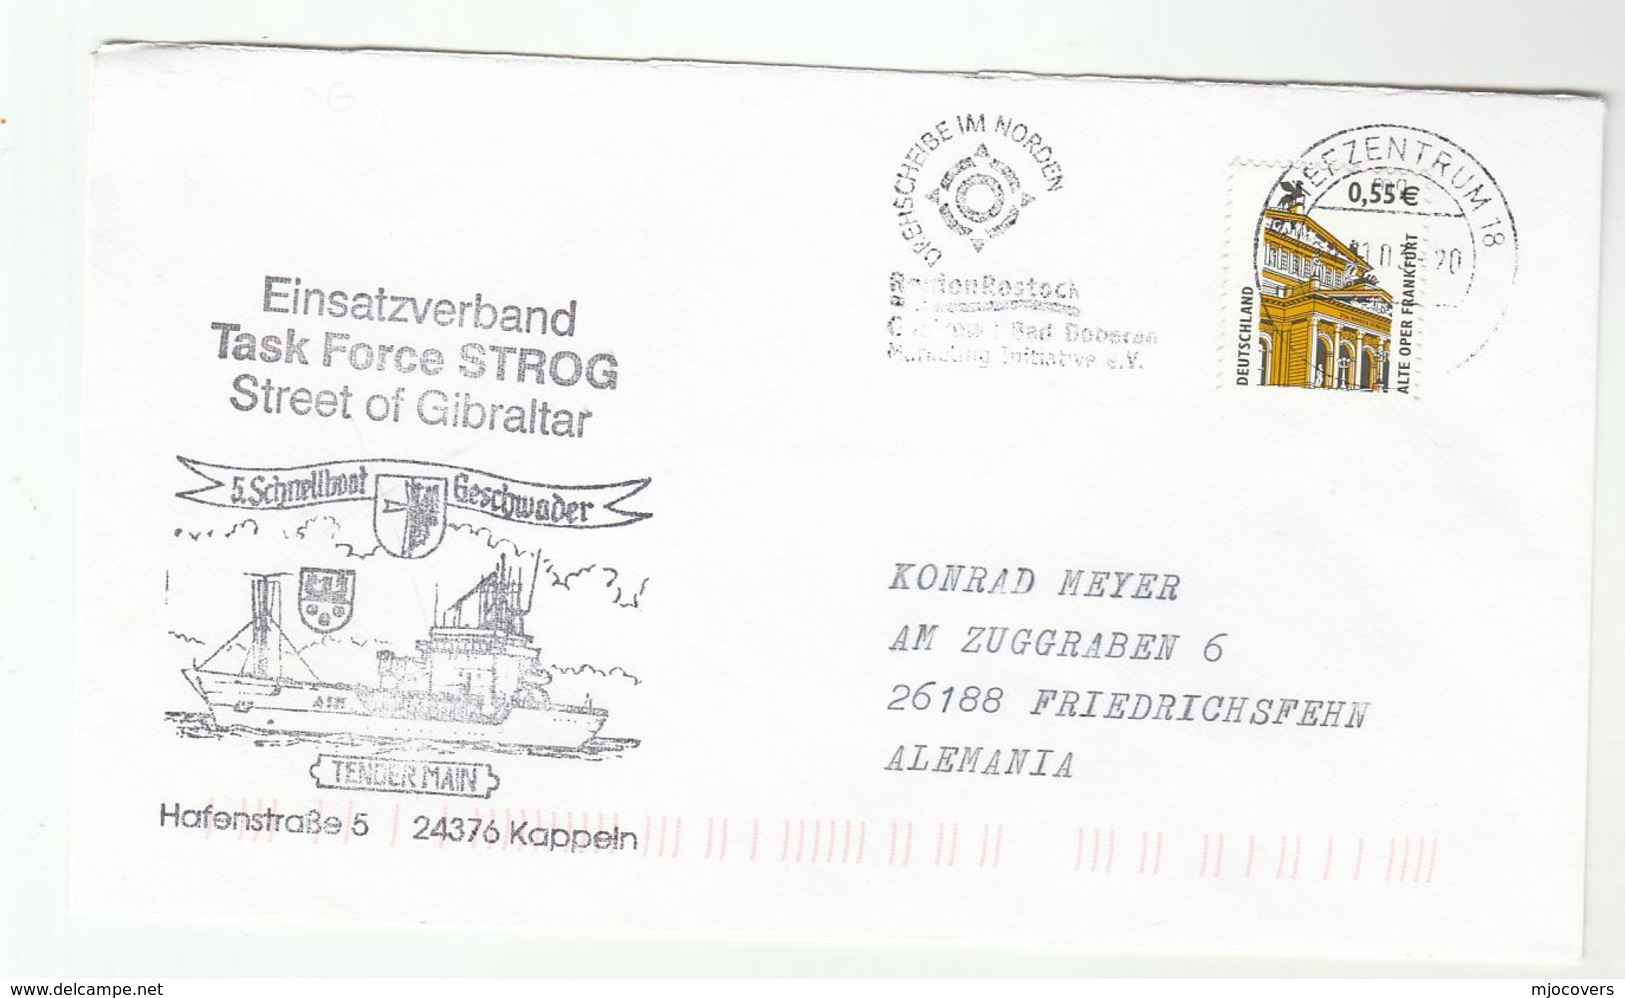 2003 STROG TASKFORCE GIBRALTAR - GERMANY NAVY SHIP Cover Germany Stamps Nato Forces - NATO